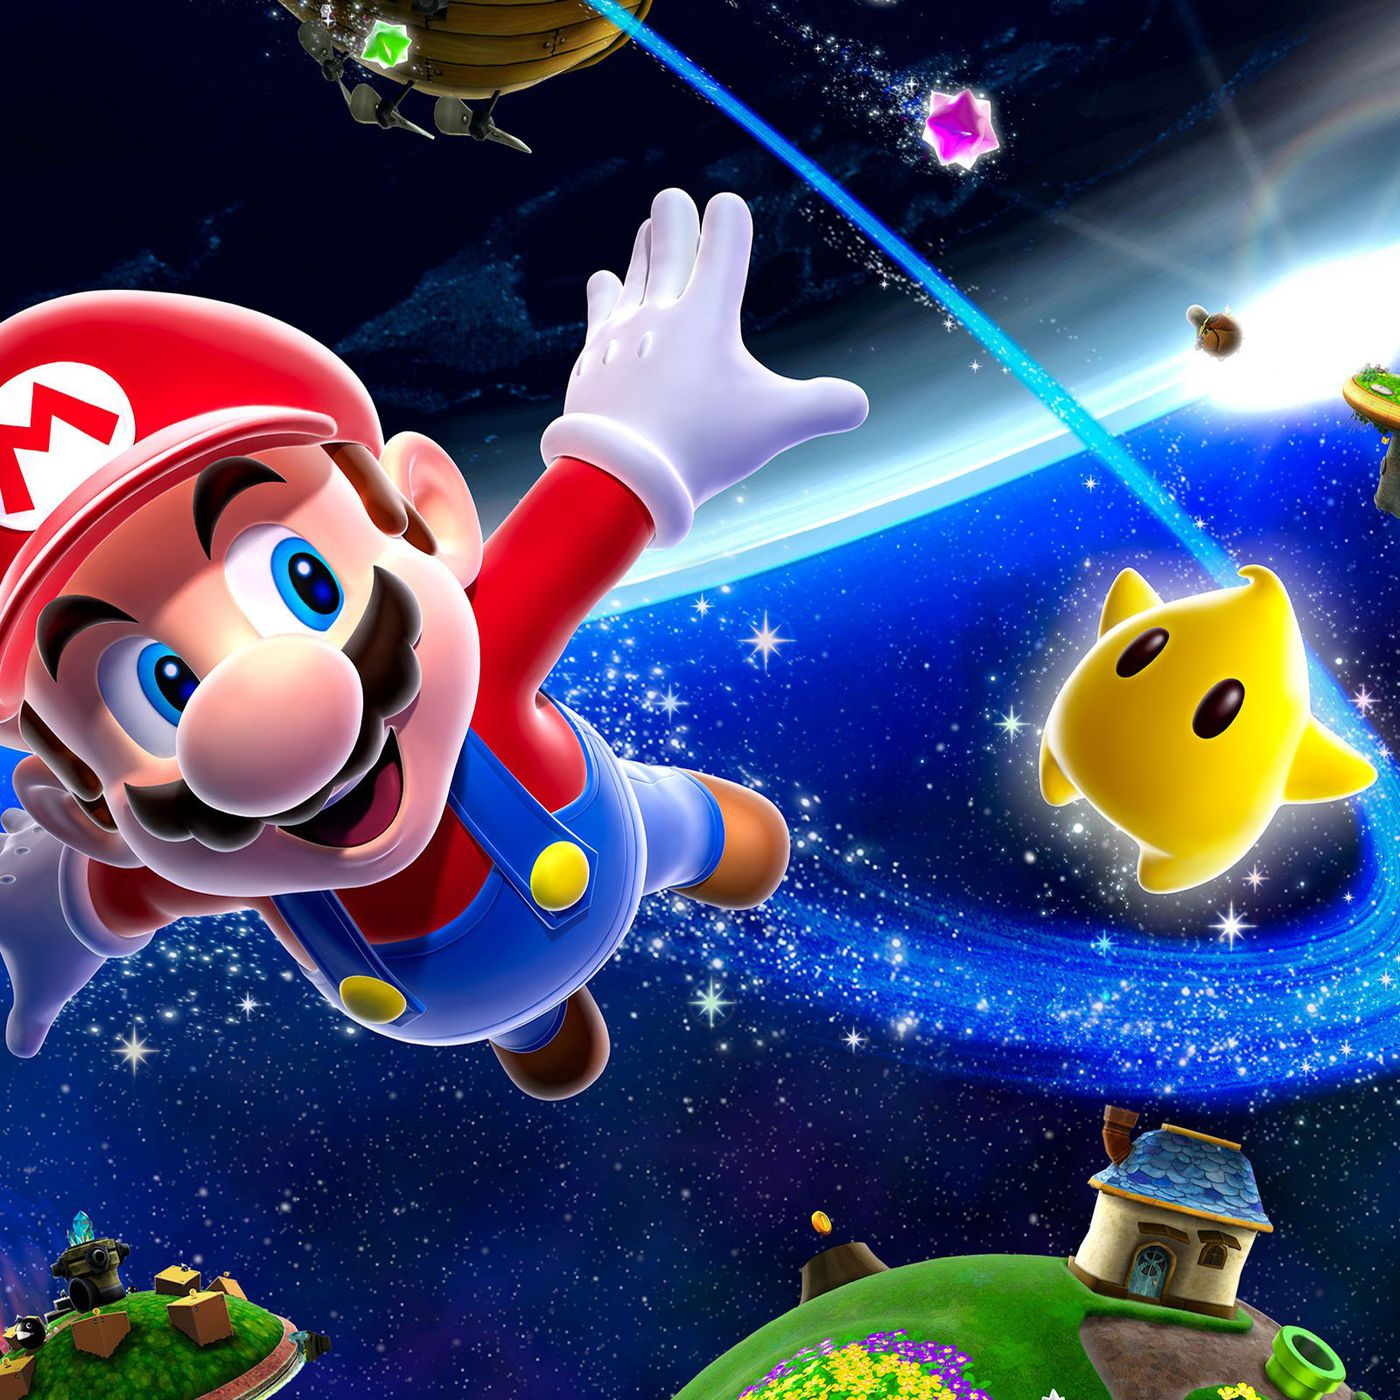 Nintendo re-releasing Super Mario games for 35th anniversary ...